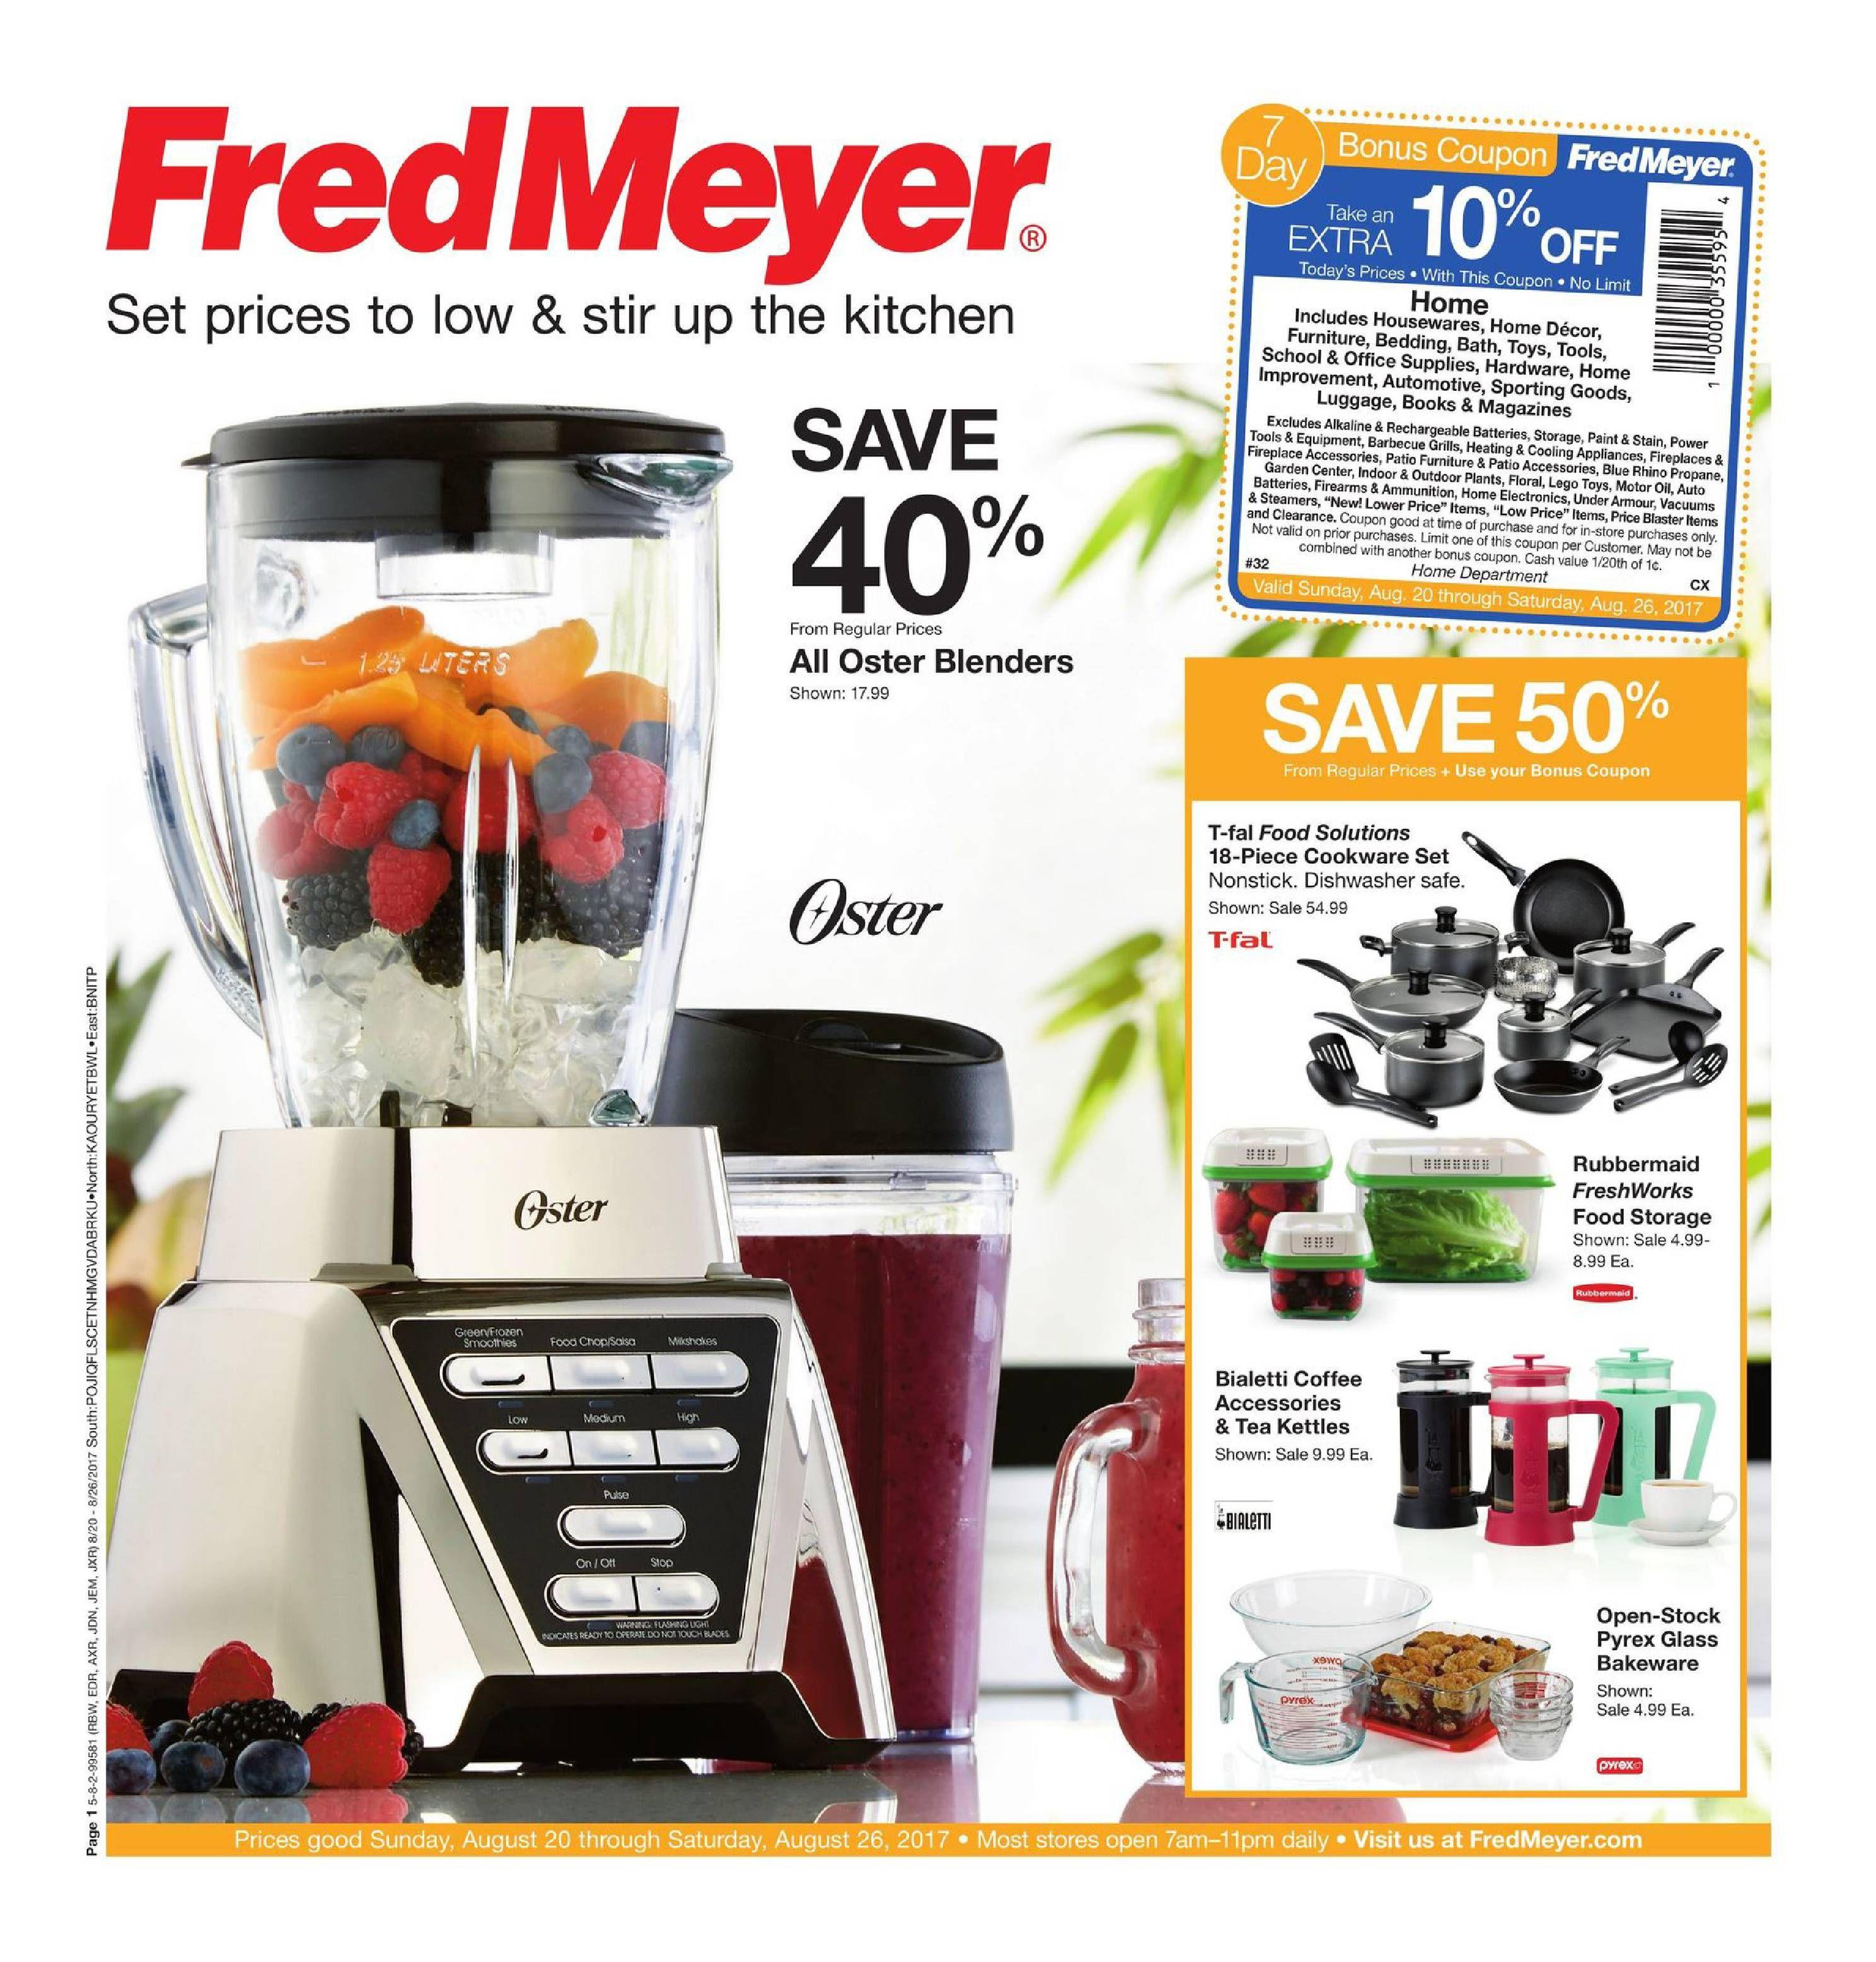 Fred Meyer Merchandise Ad August 20 - 26, 2017 - http://www ...